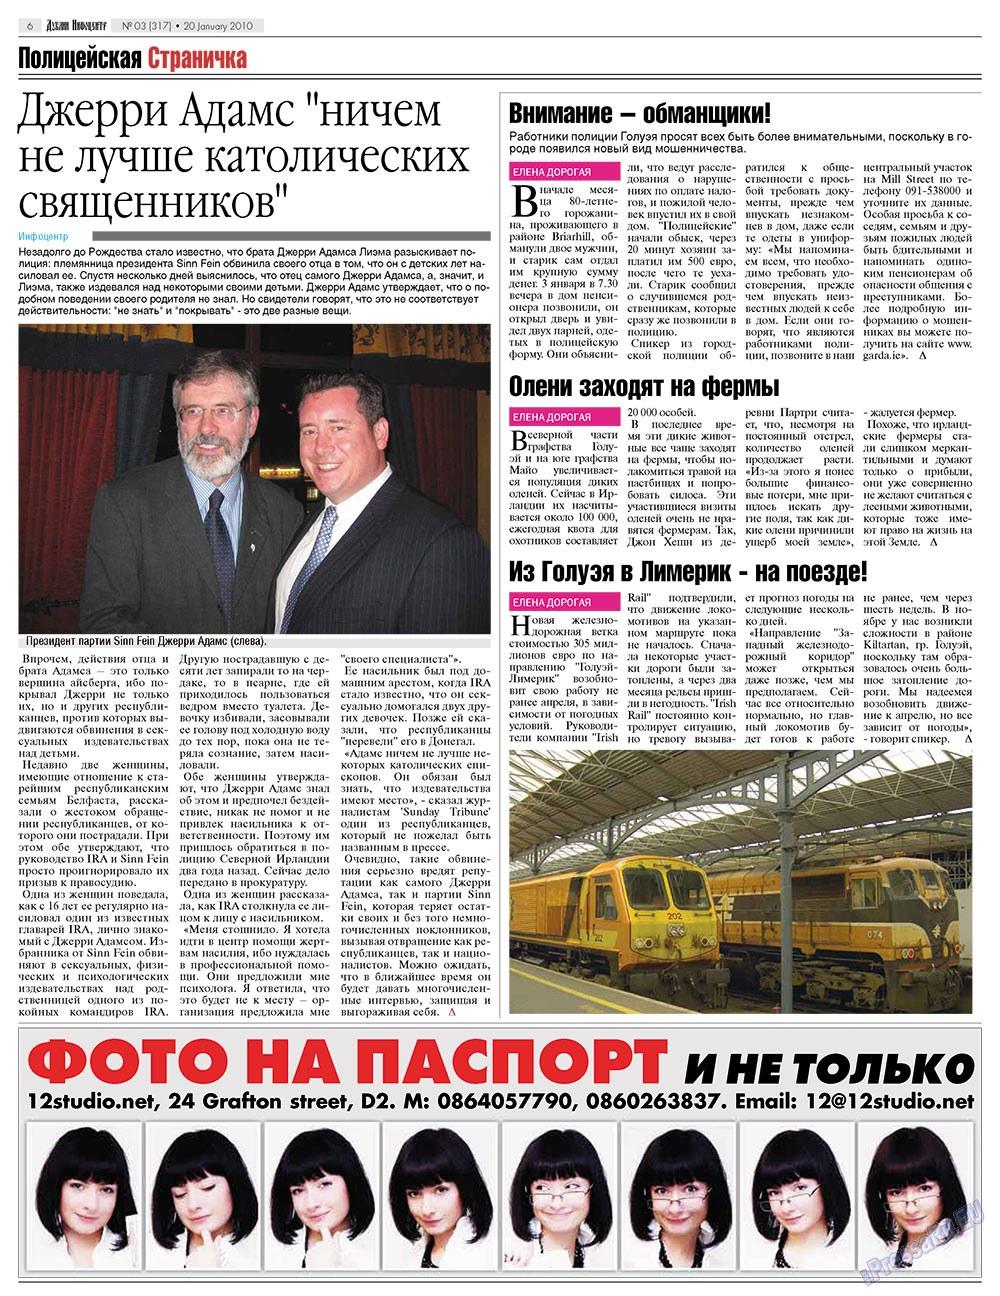 Дублин инфоцентр (газета). 2010 год, номер 3, стр. 6